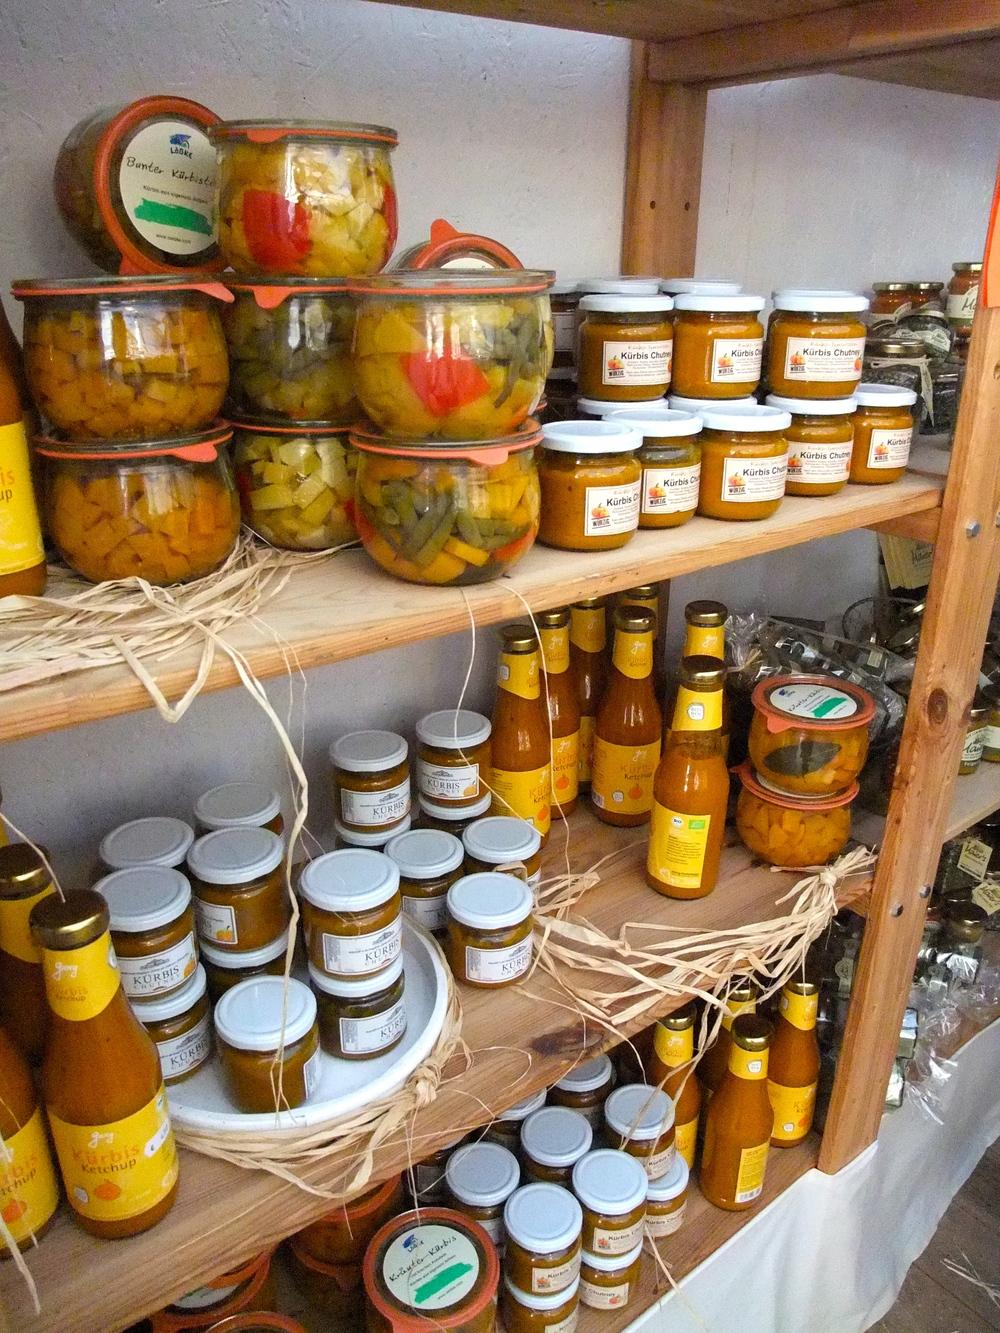 Jars of pumpkin curry, ketchup, and pumpkin